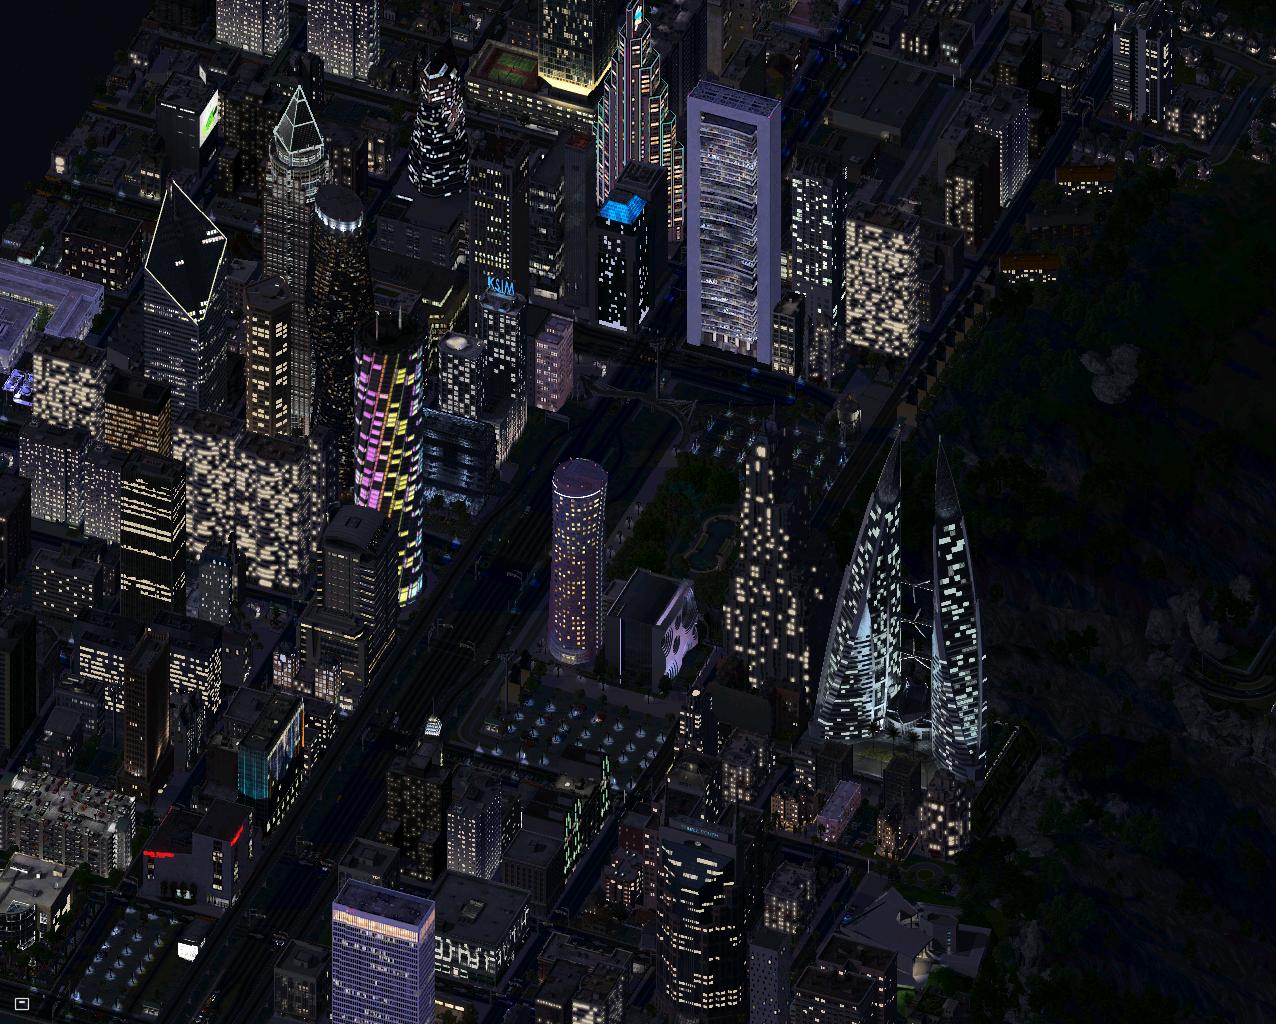 kuan_yin_downtown_night_sc4_by_soulproductions-d5rxzr1.png